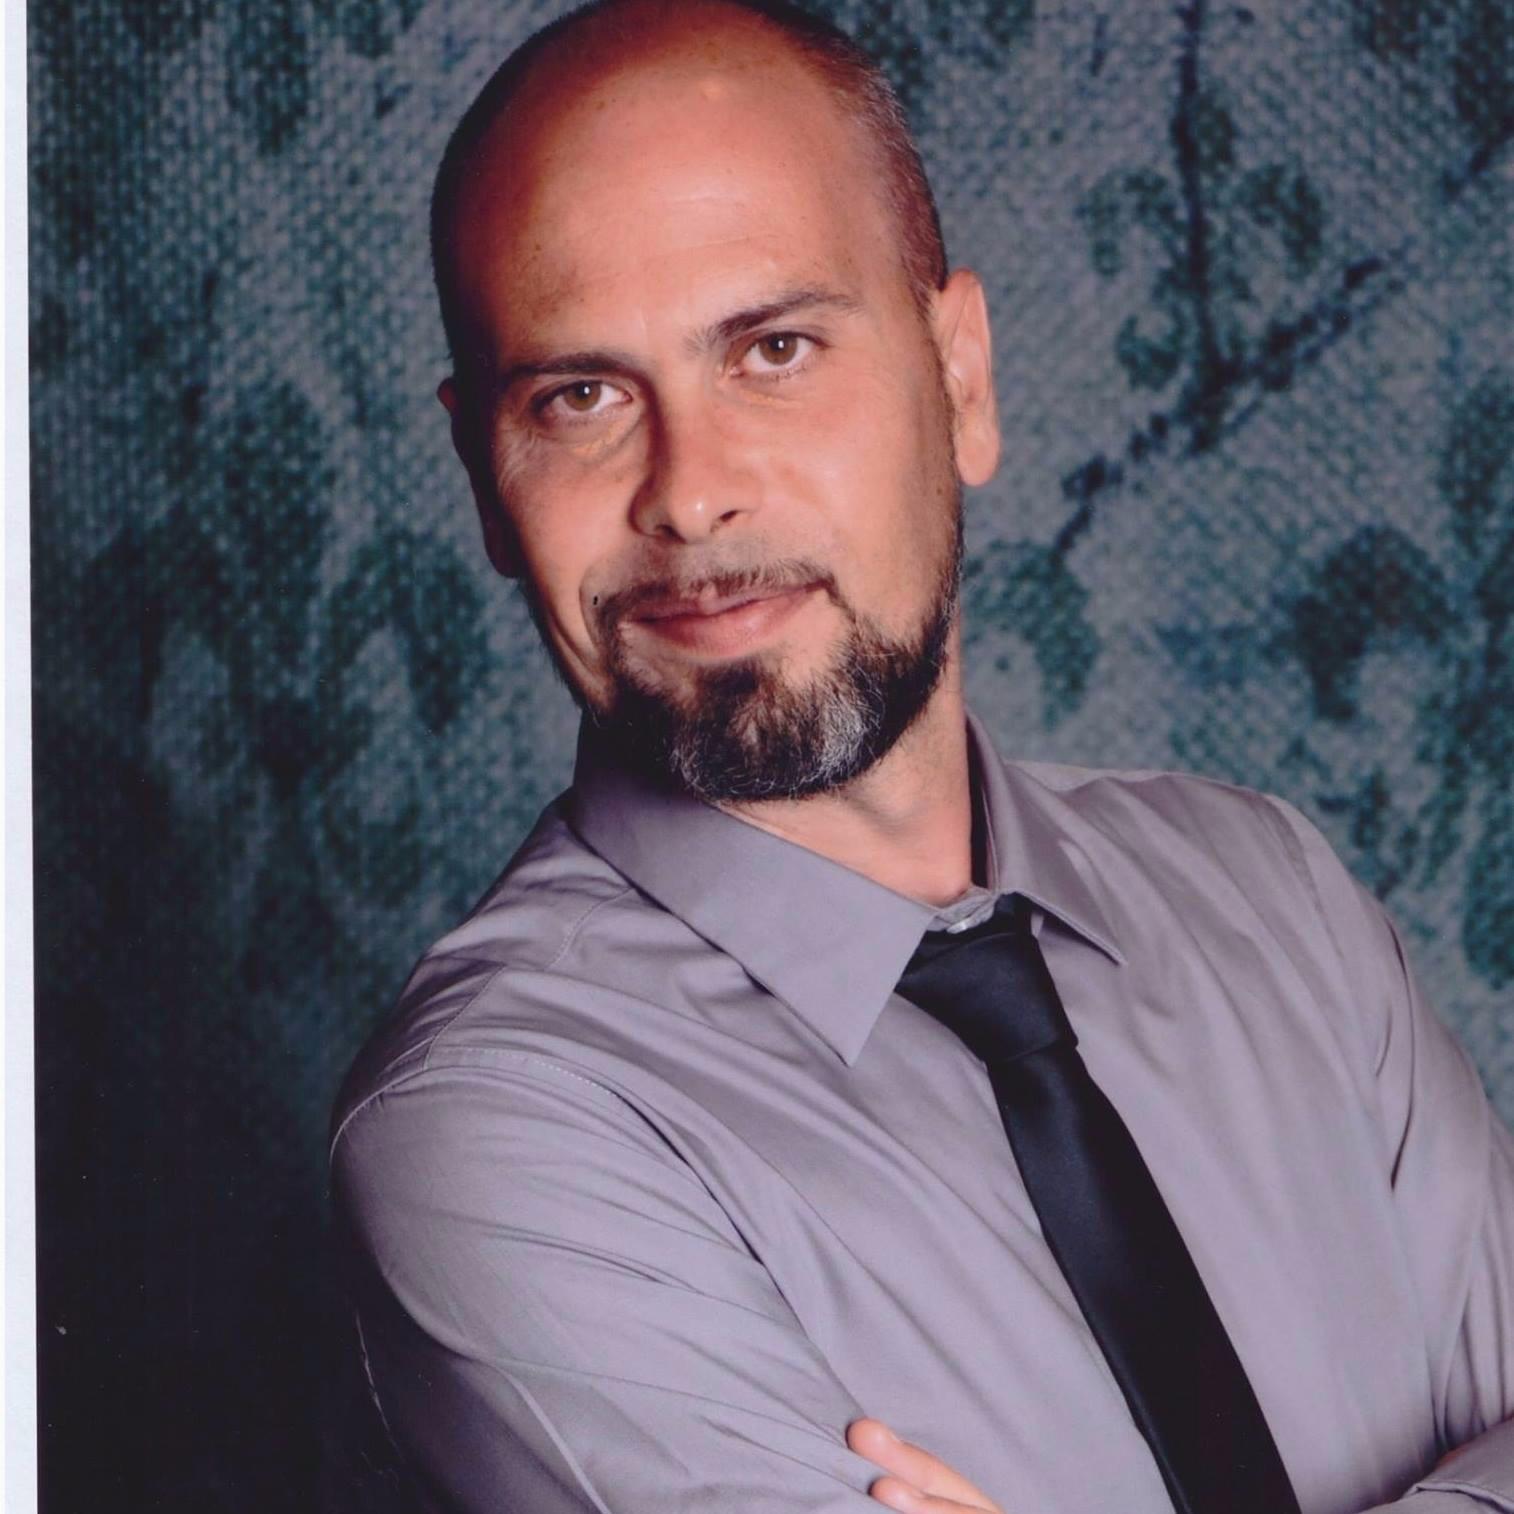 Dott. Angelo Barretta